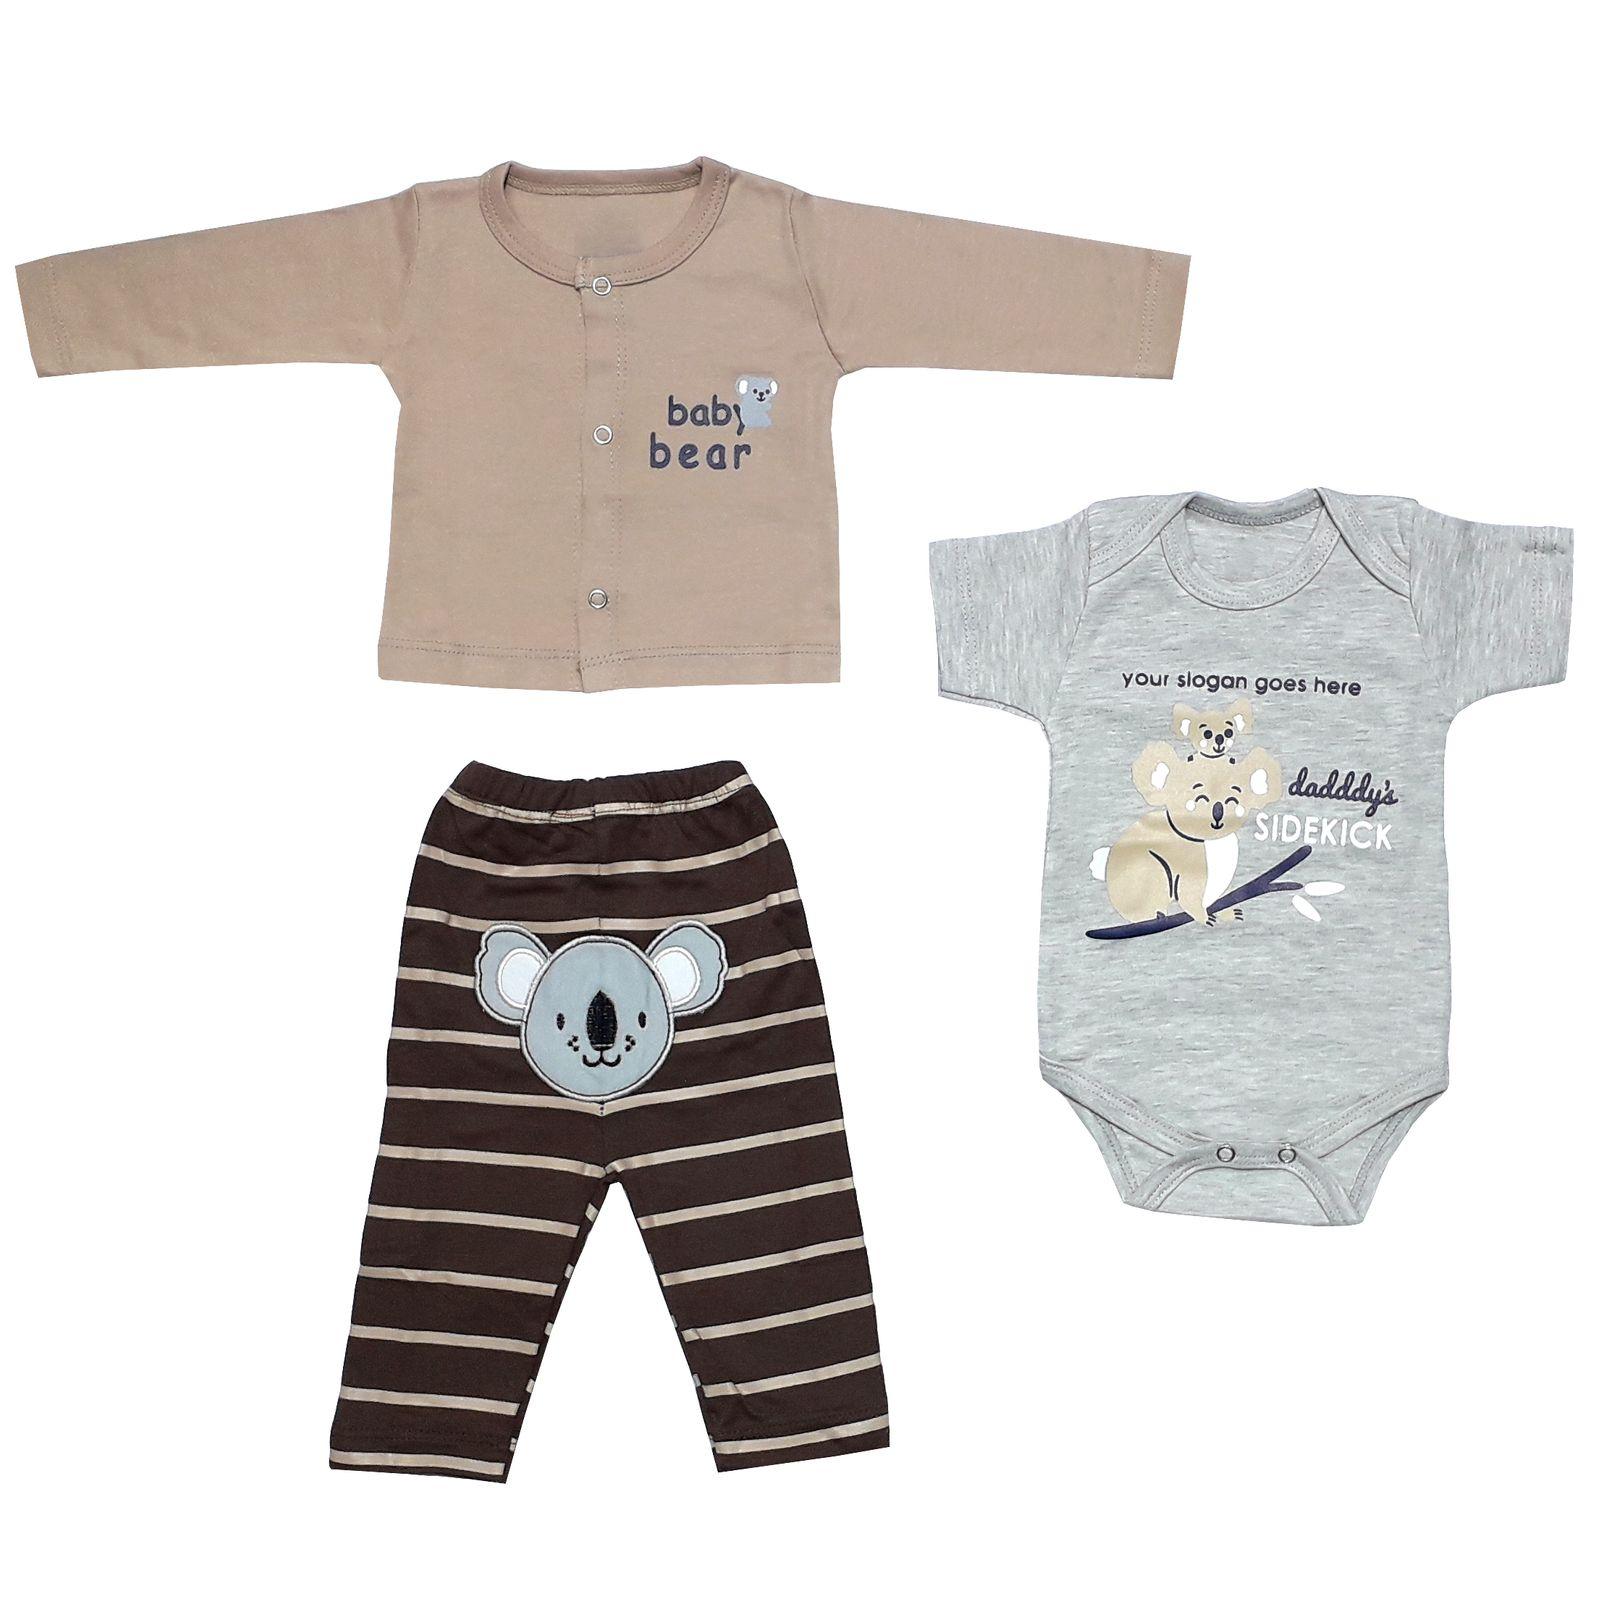 ست 3 تکه لباس نوزادی پسرانه طرح کوالا کد 1101 -  - 1